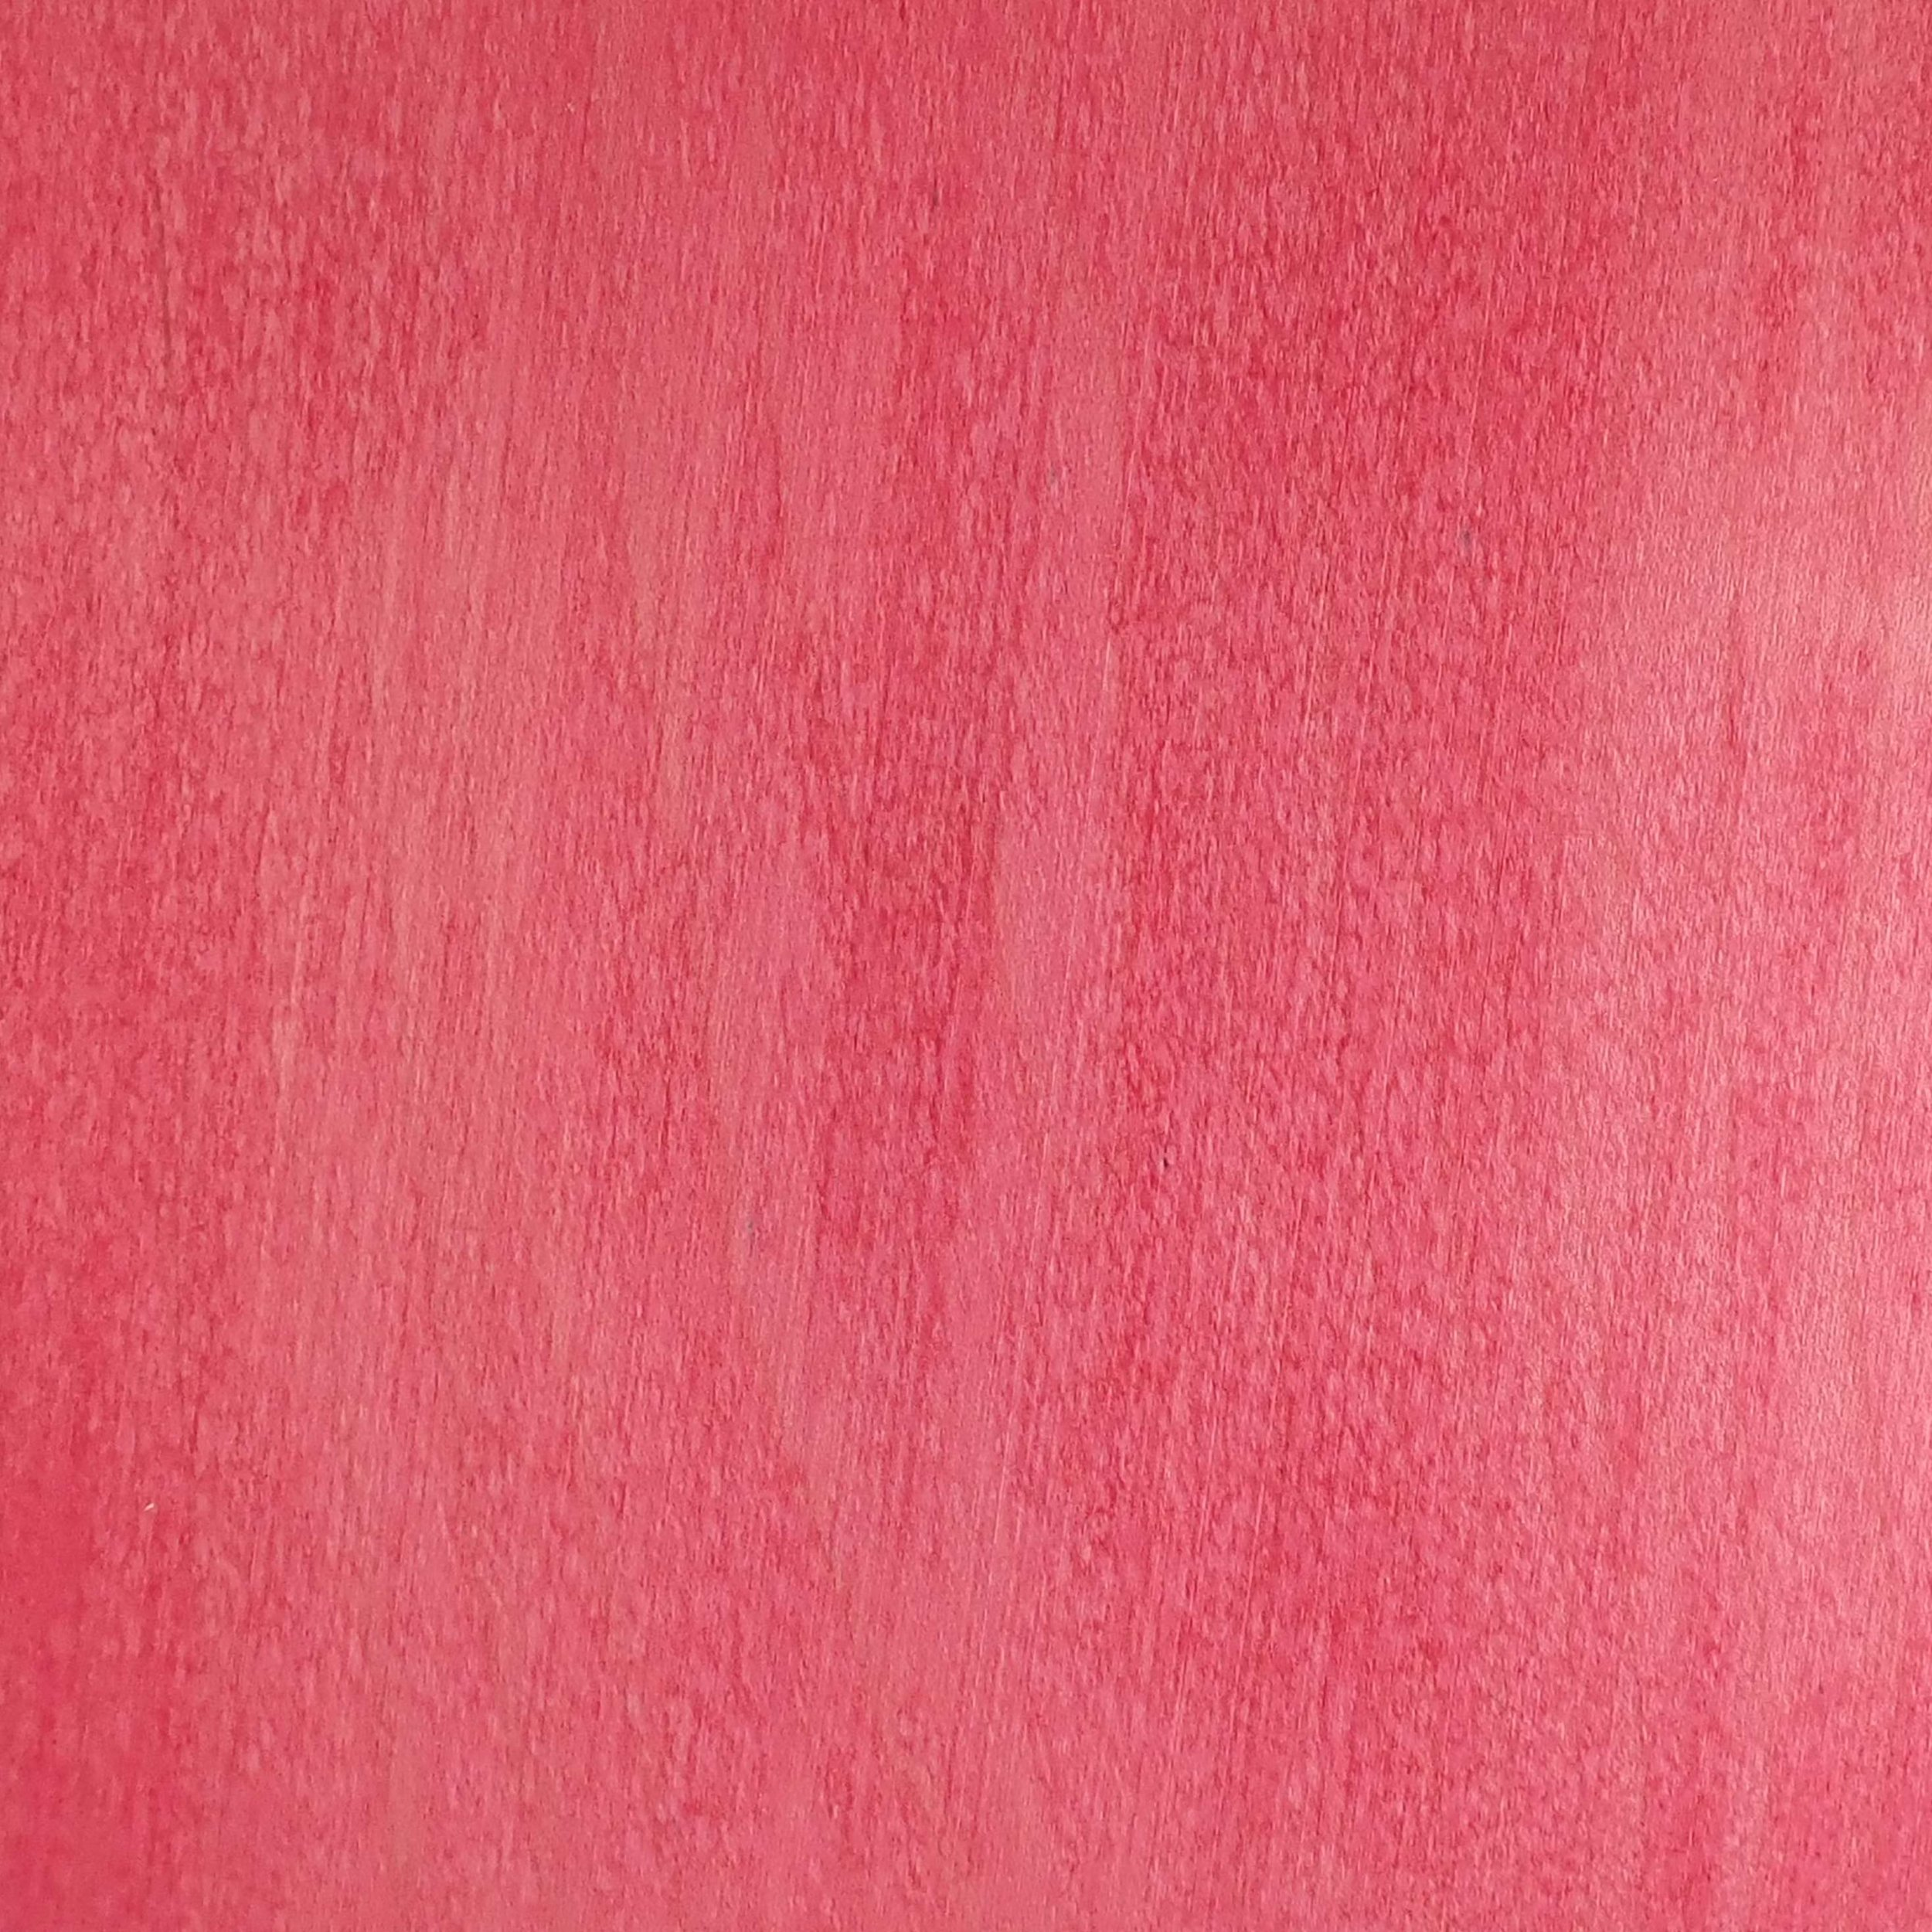 Pink, Salmon